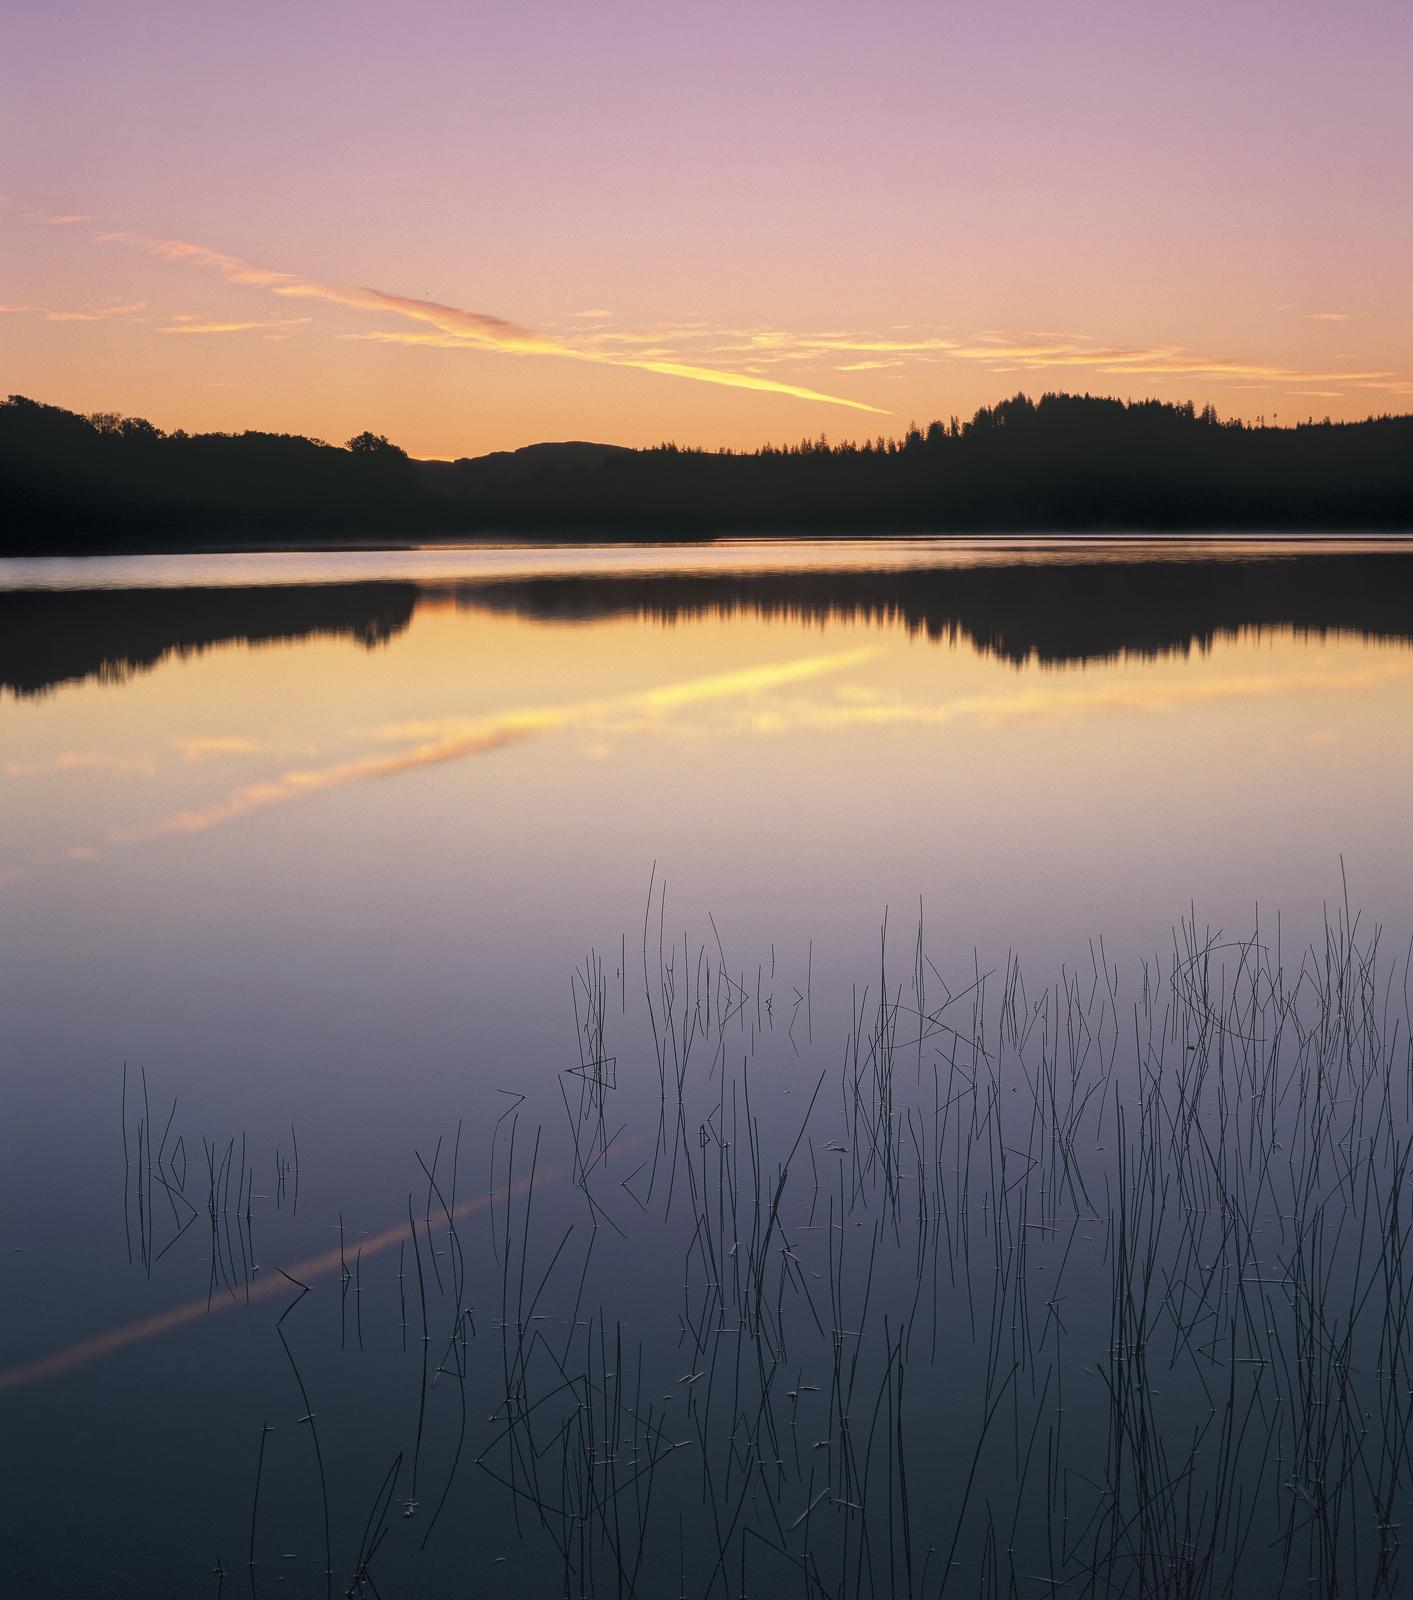 Achray Pastel, Loch Achray, Trossachs, Scotland, moment, perfection, twilight, sunrise, blends, seamlessly, smoothly, re, photo